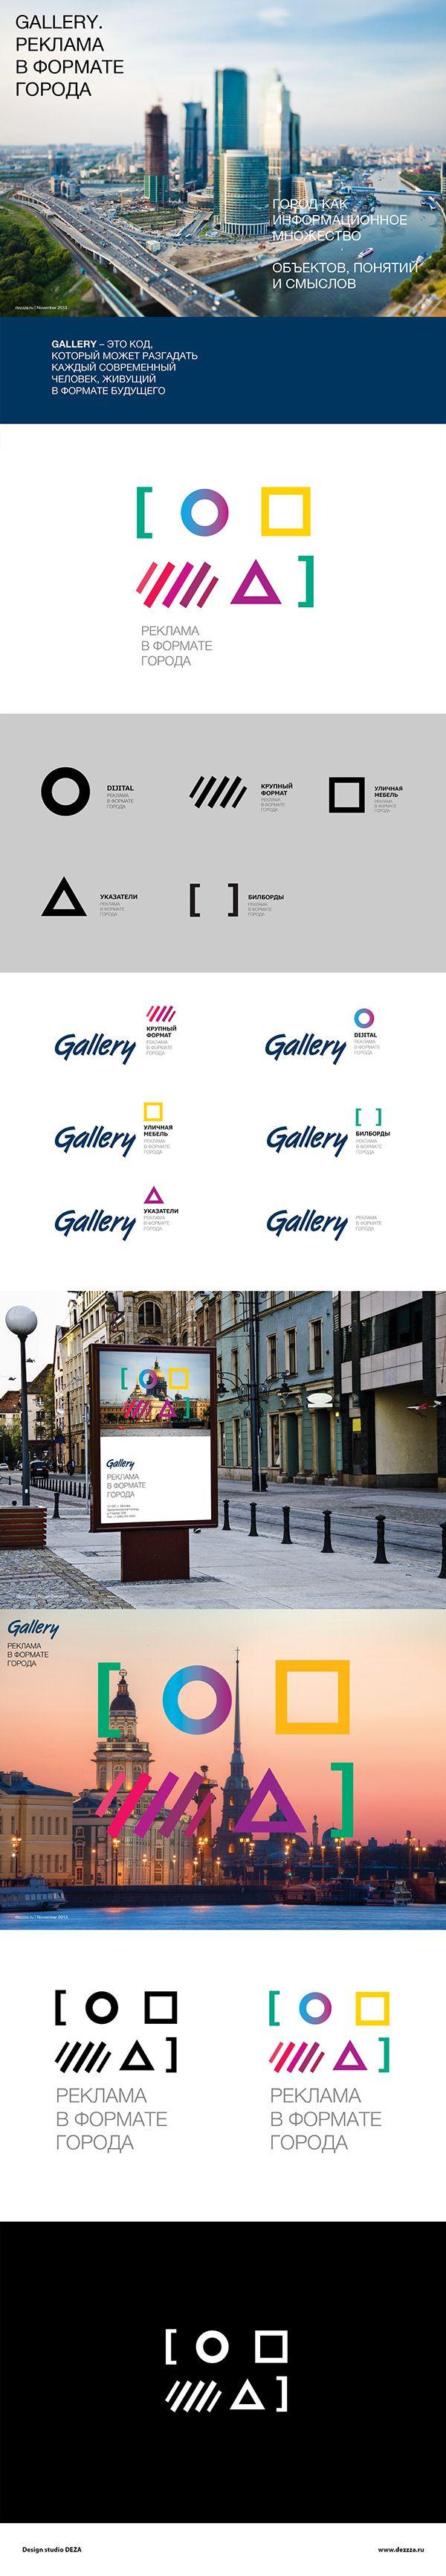 Icon System for Gallery / Russian adv. company / vol.1 by Design Studio Deza / St. Petersburg